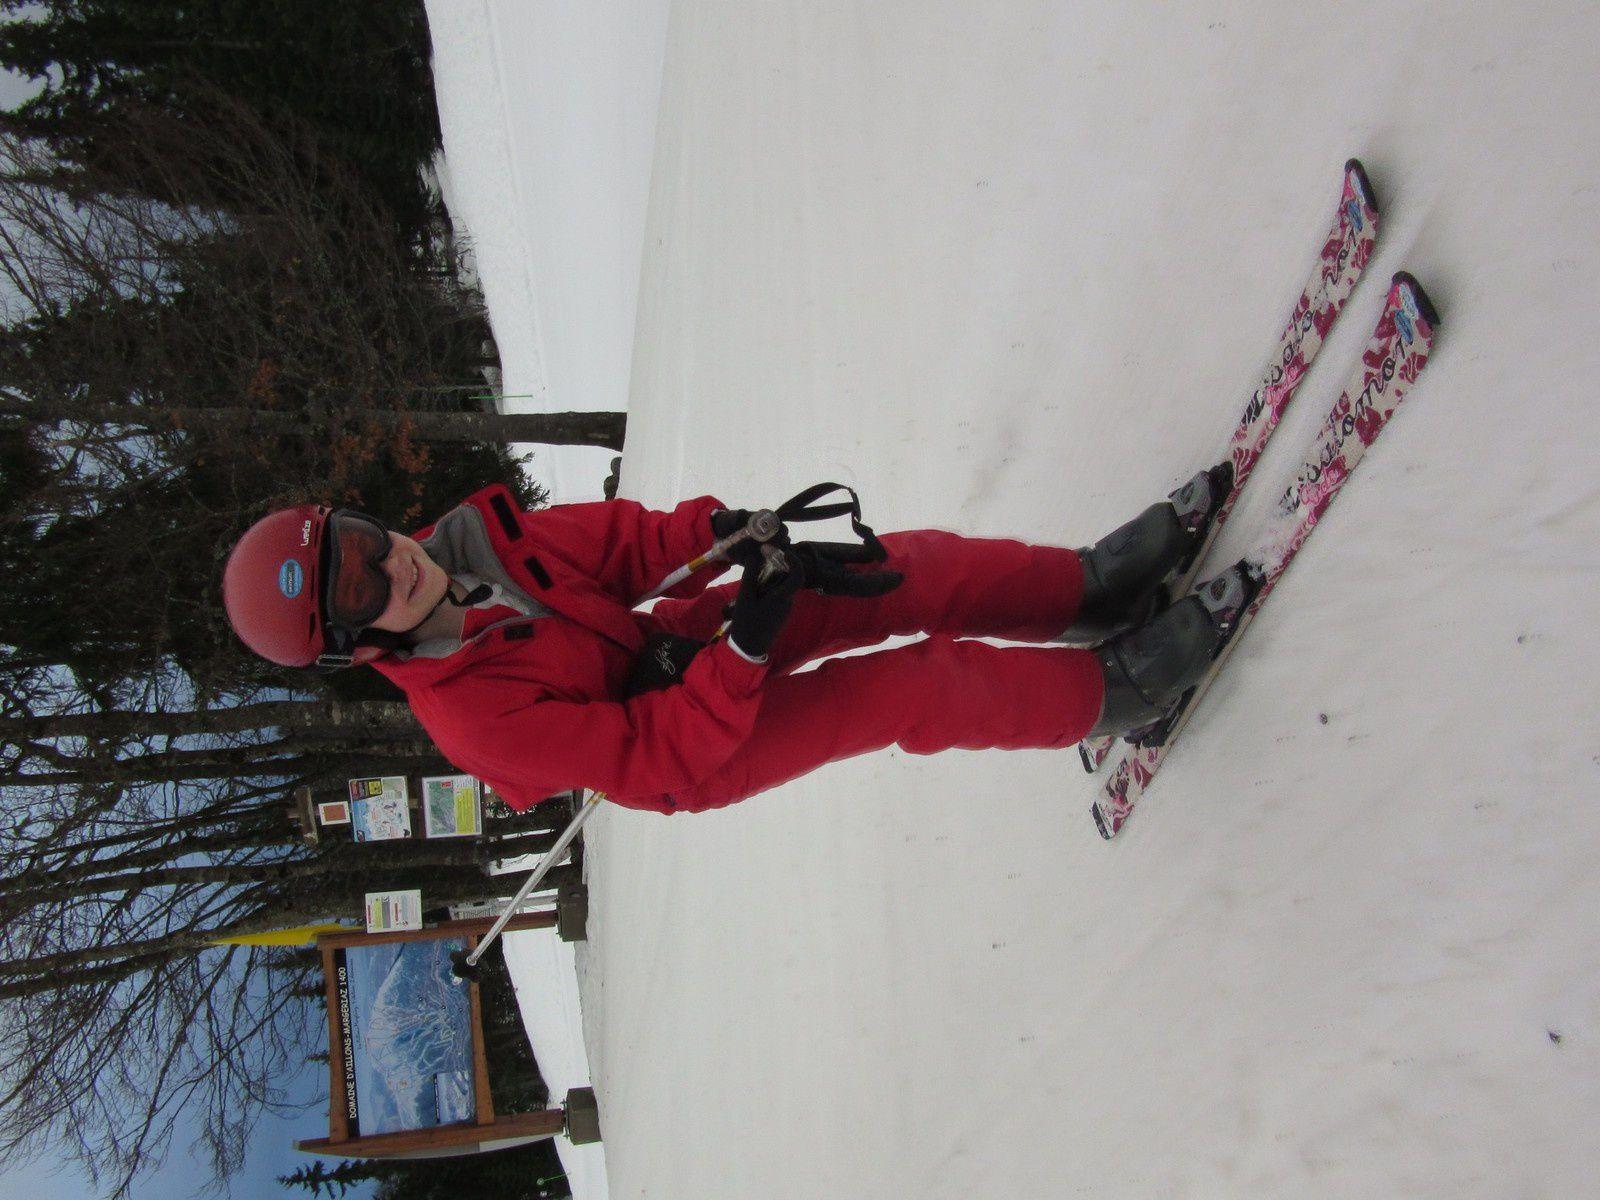 ski de vendredi et fromagerie